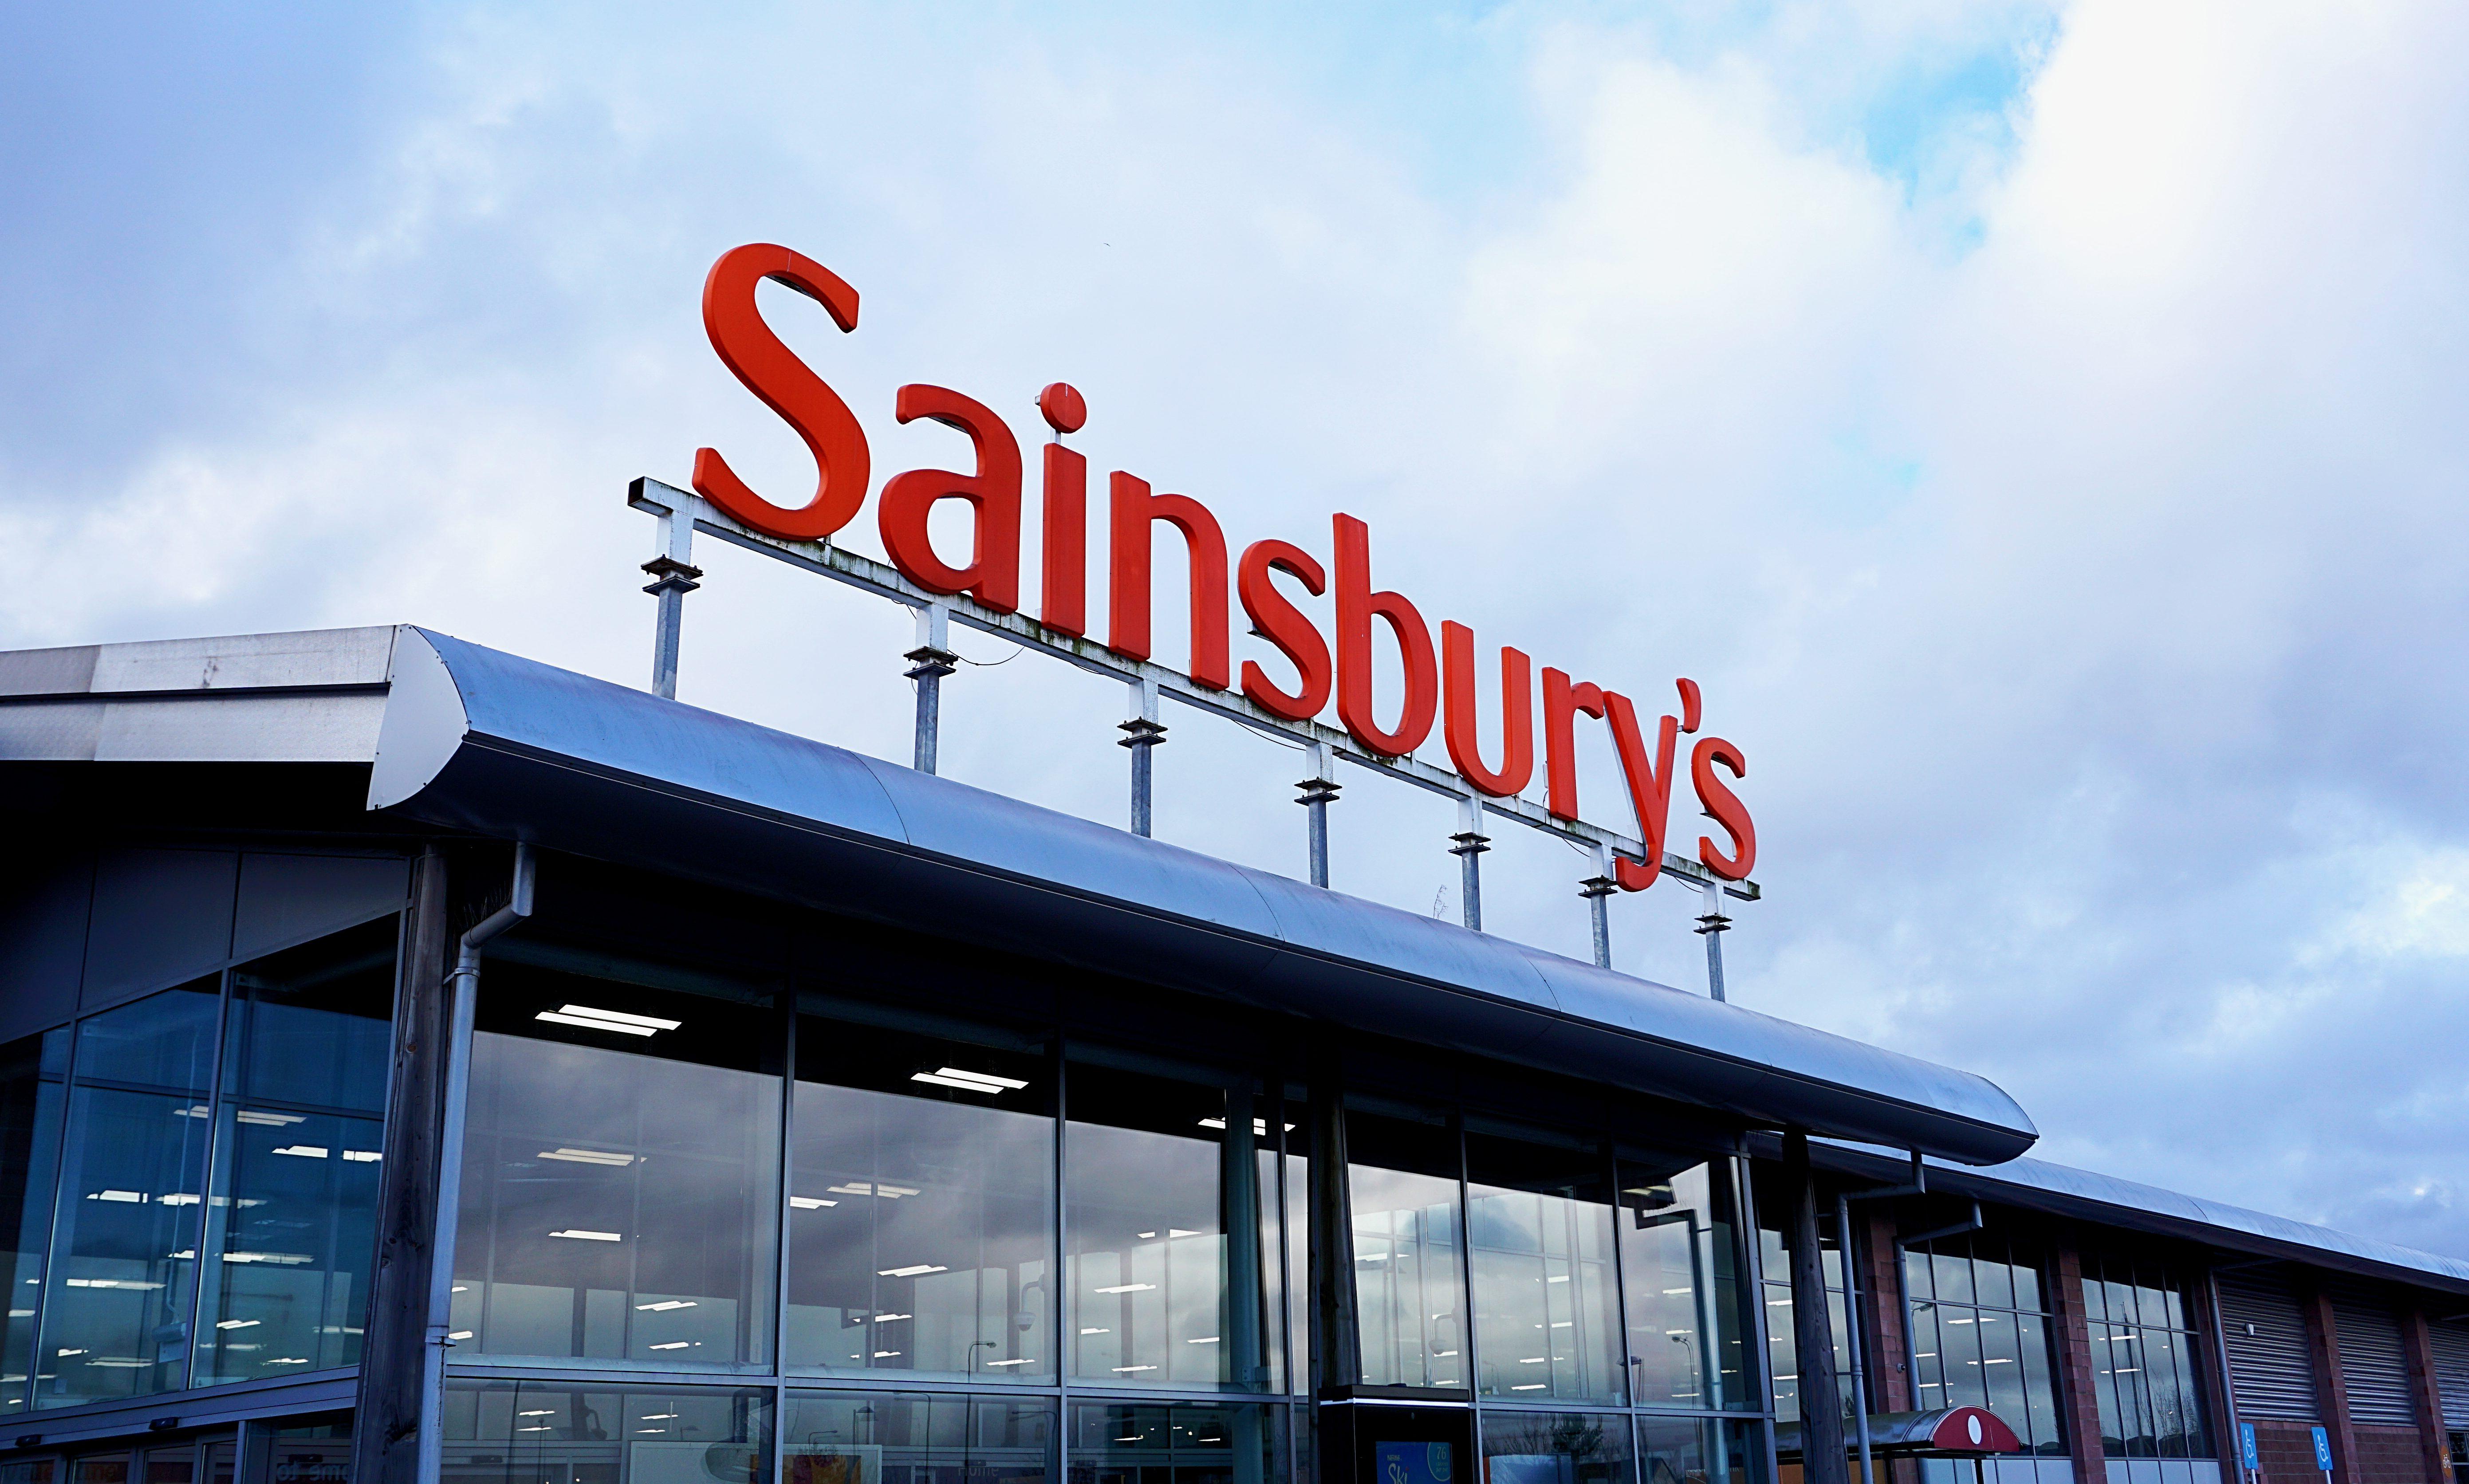 Sainsbury's reclaim position as UK's second largest supermarket